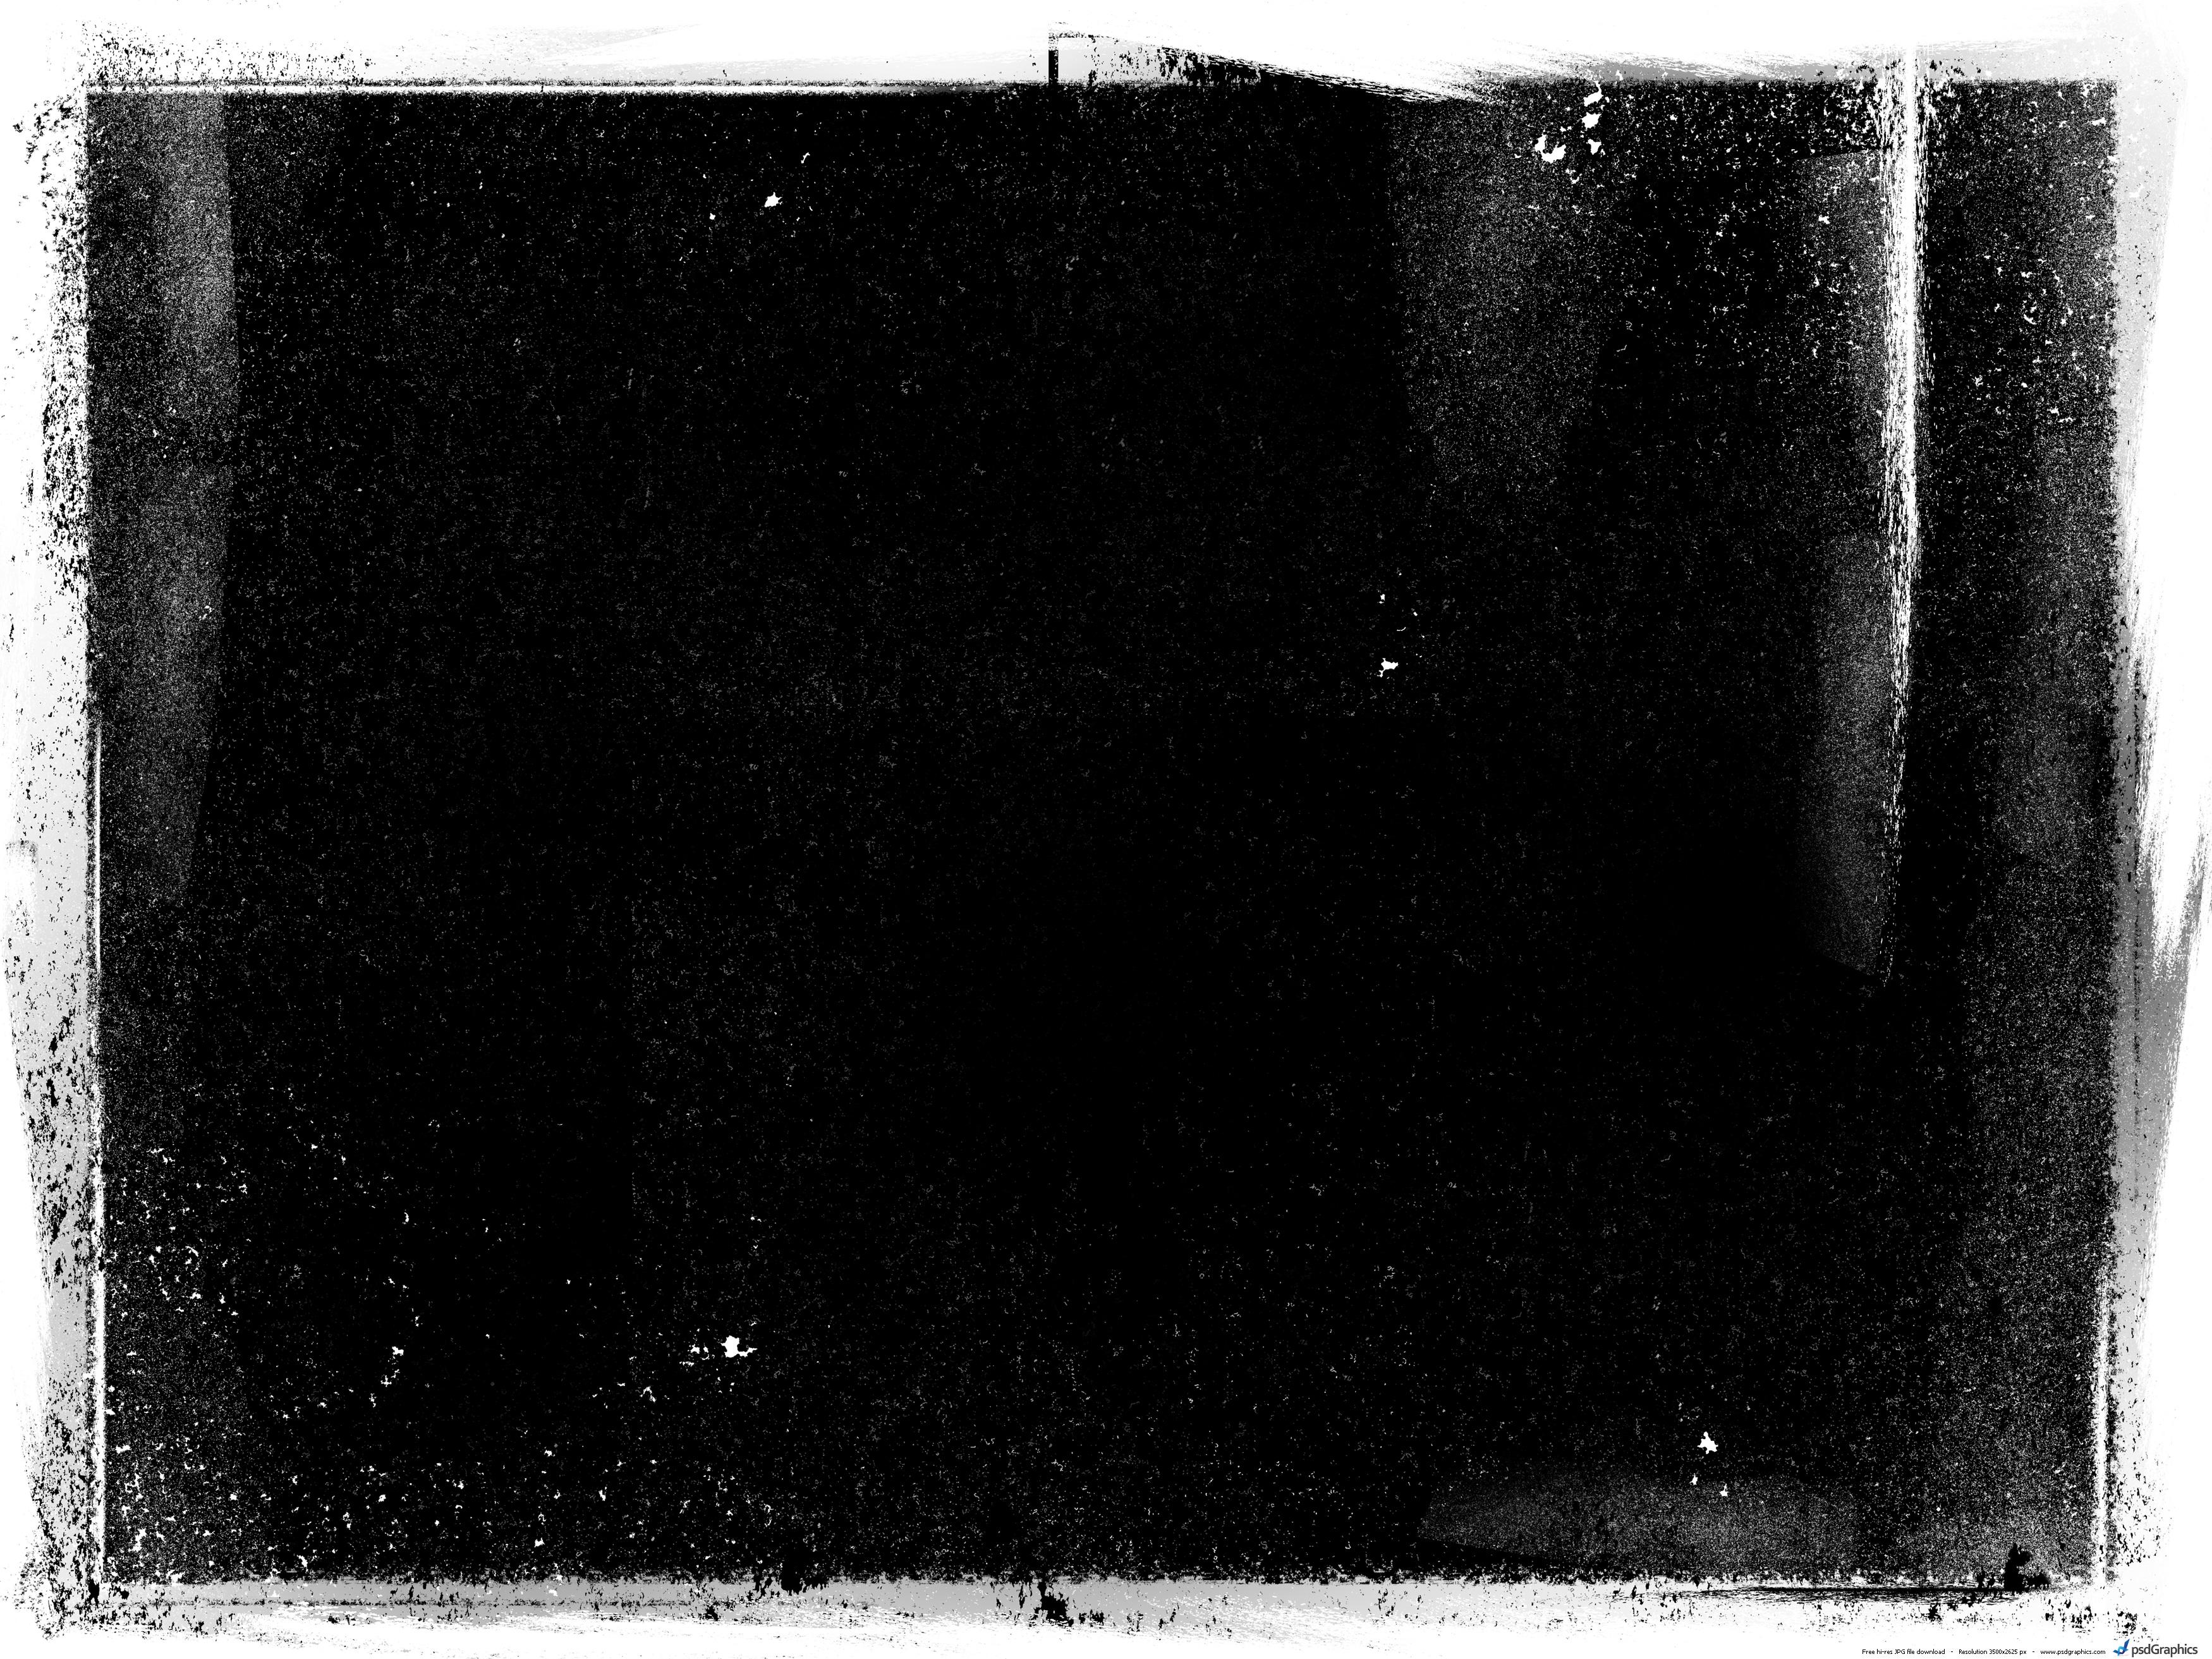 Black White Grunge Background